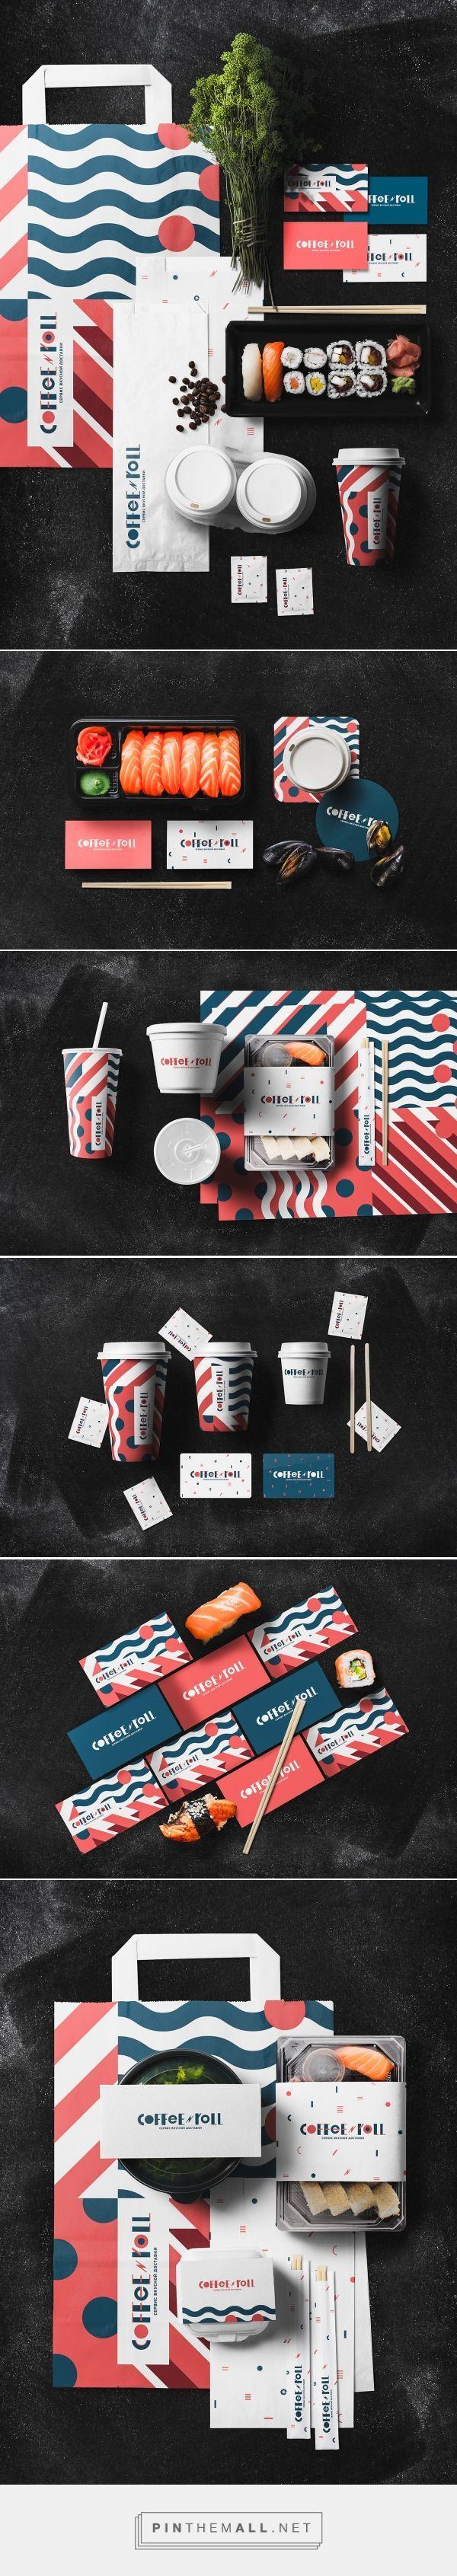 Behance的日本食品配送服务的品牌和包装由俄罗斯联邦Dimitry Neal Orel策划,由Packaging Diva PD策划。给我注册:)